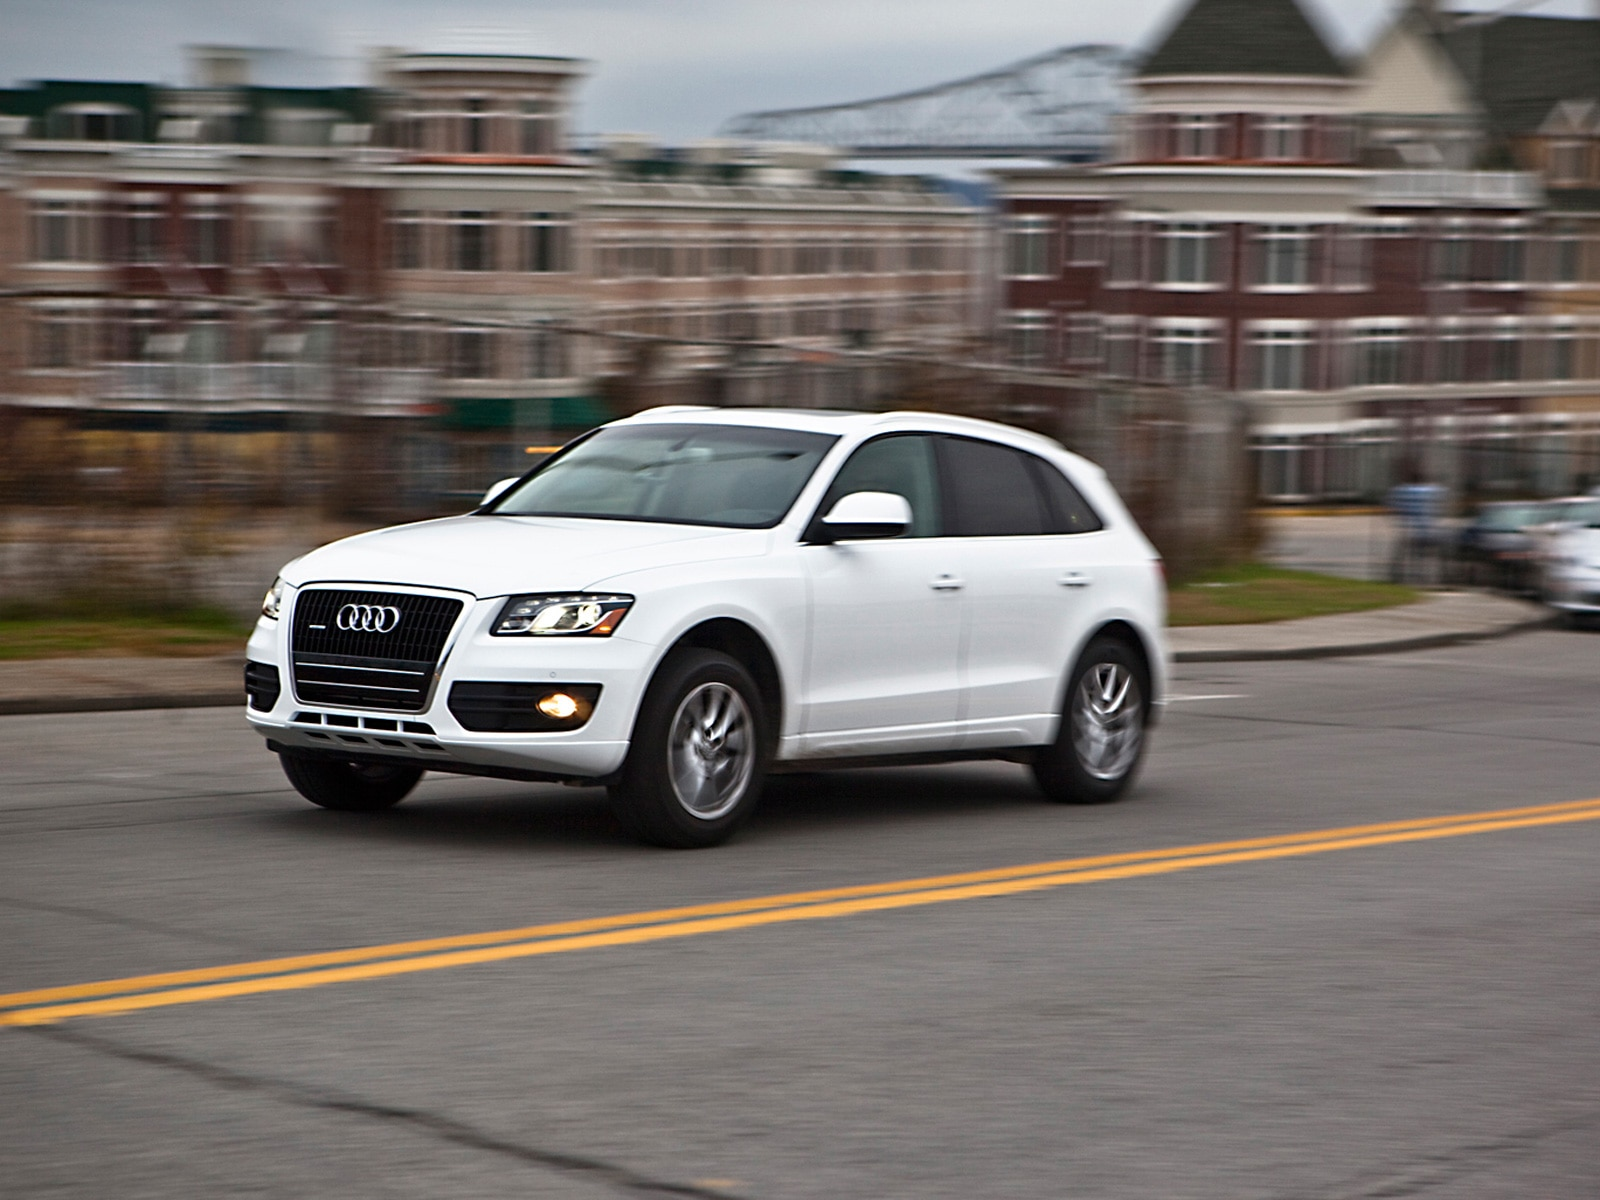 2010 Audi Q5 3.2 - Audi Luxury Crossover SUV Long Term Review - Automobile Magazine